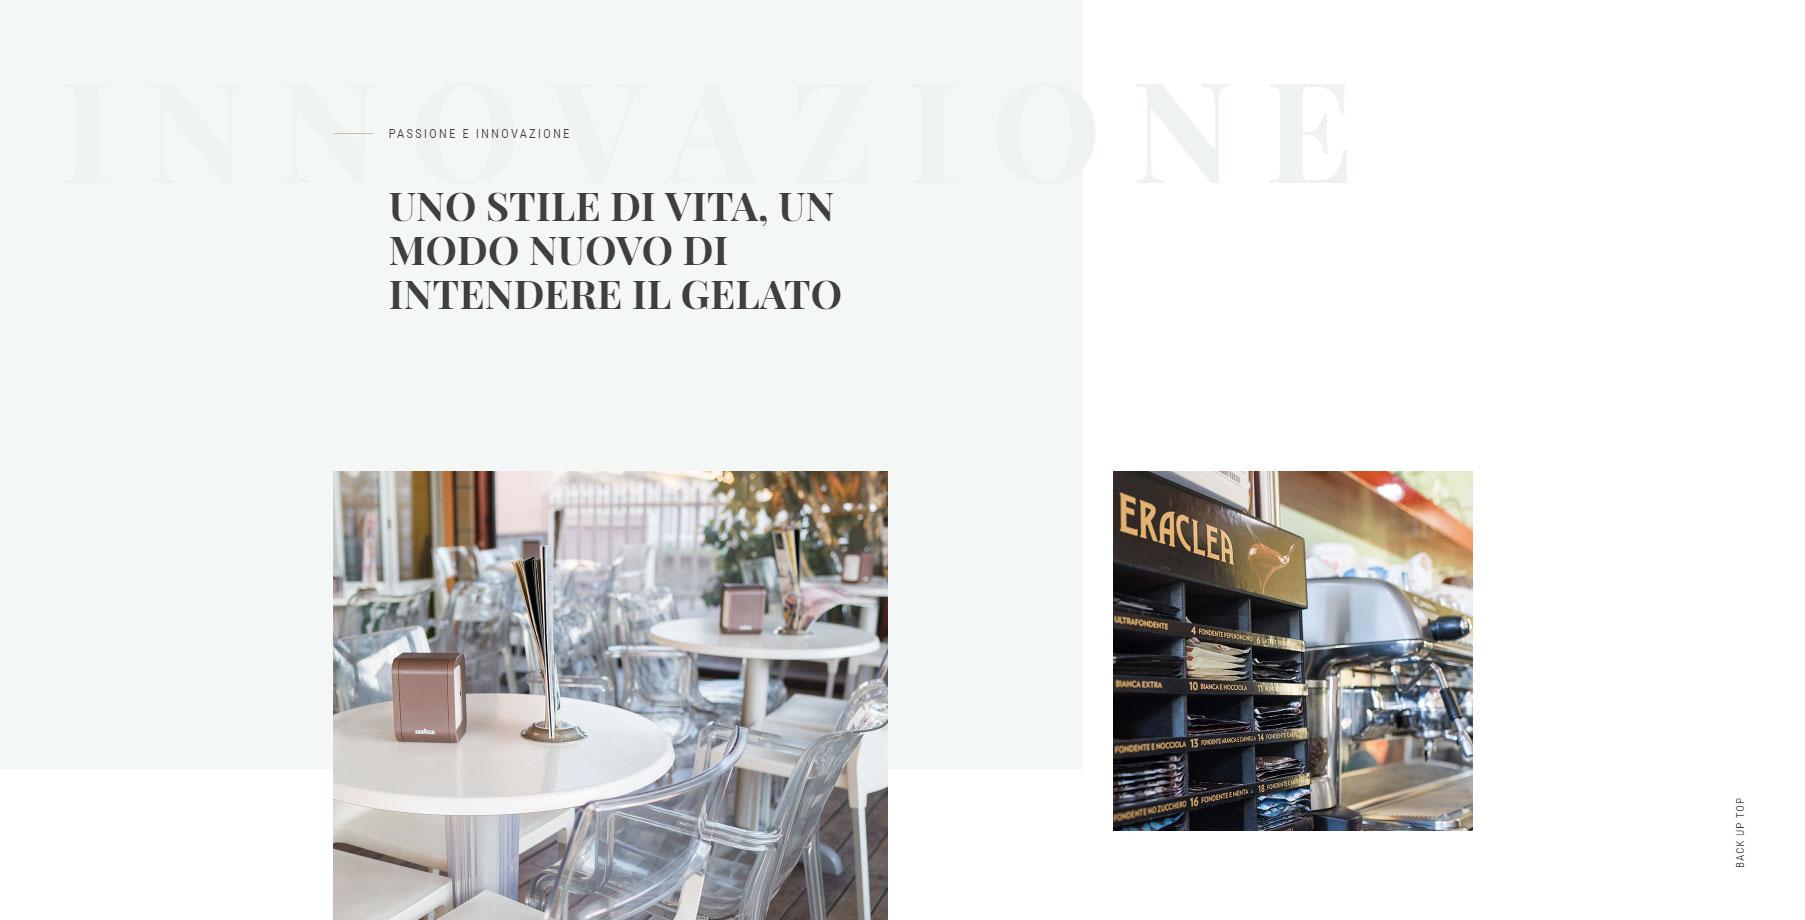 Capani La Gelateria - Website of the Day